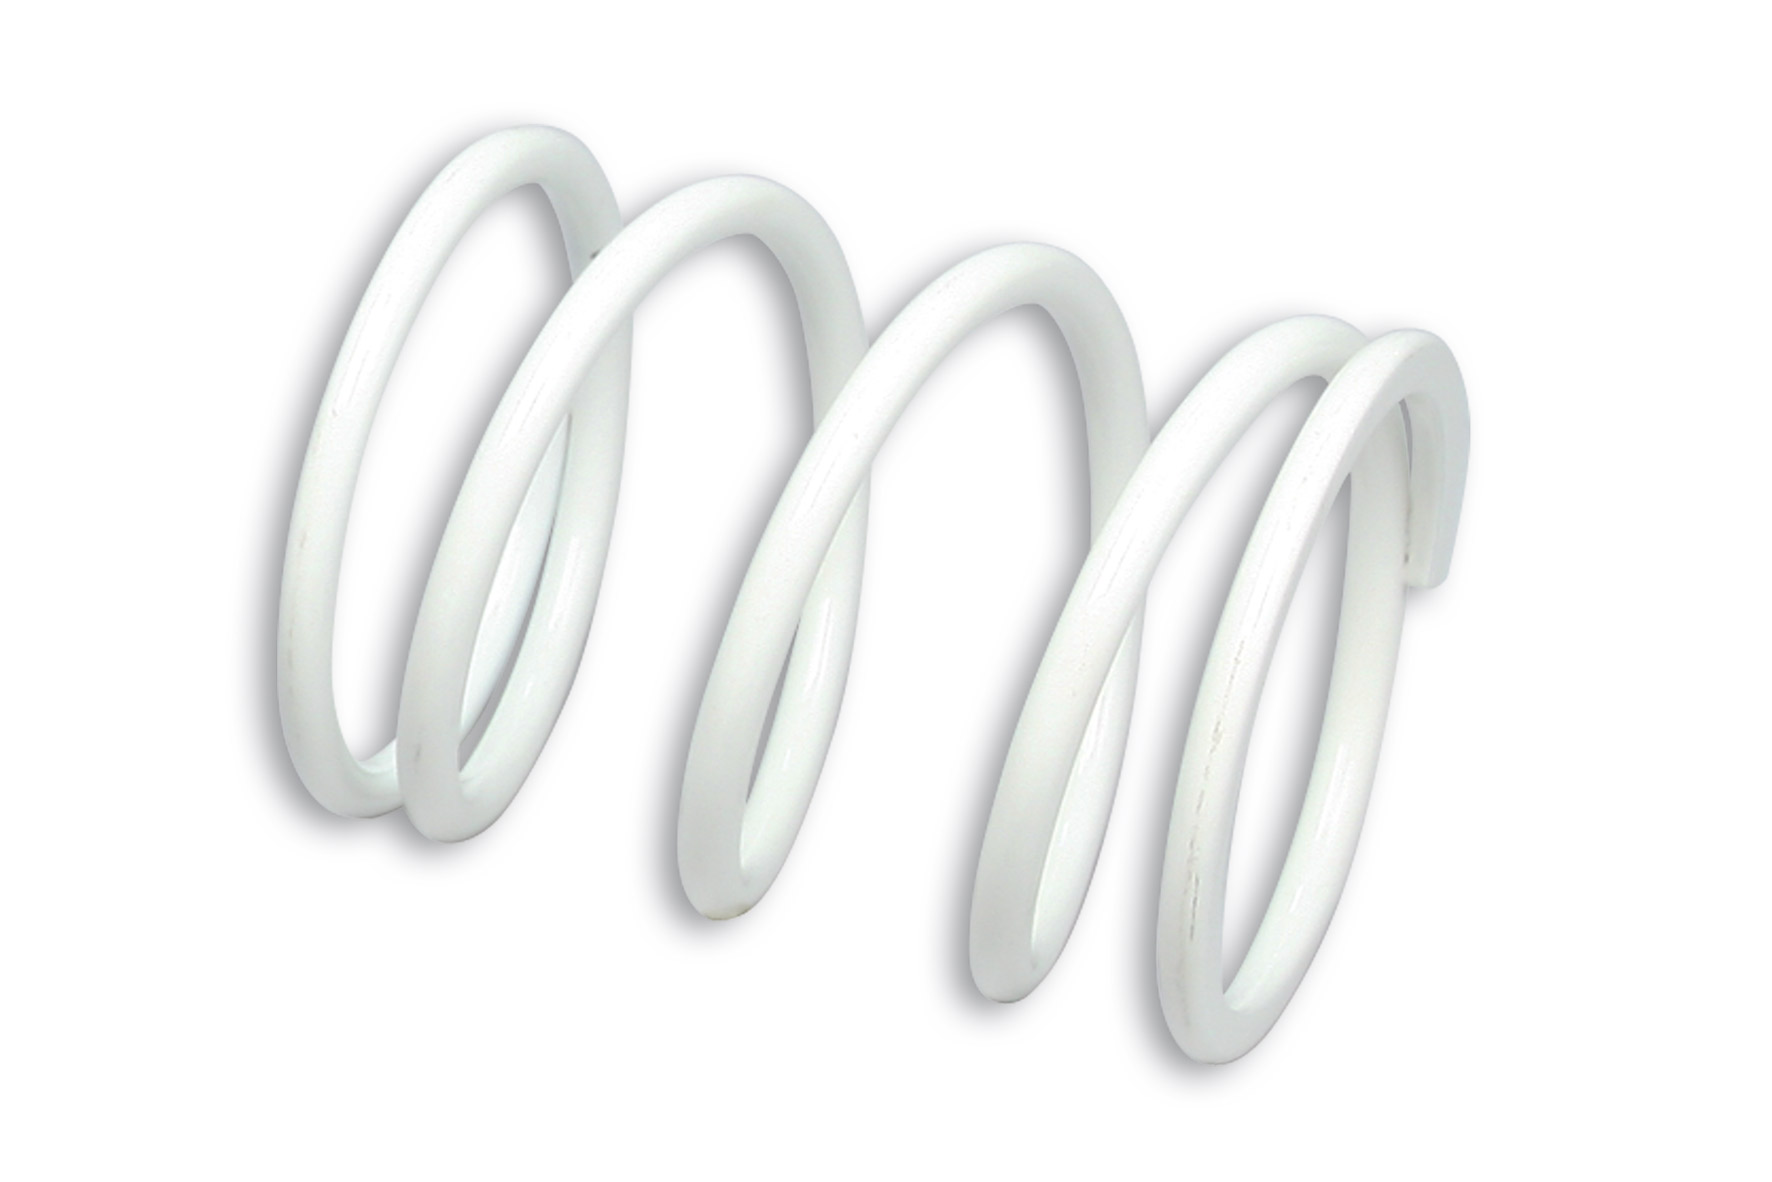 Molla di contrasto variatore bianca (Ø esterno 73x96 mm - Ø filo 6 mm - k 14,5)